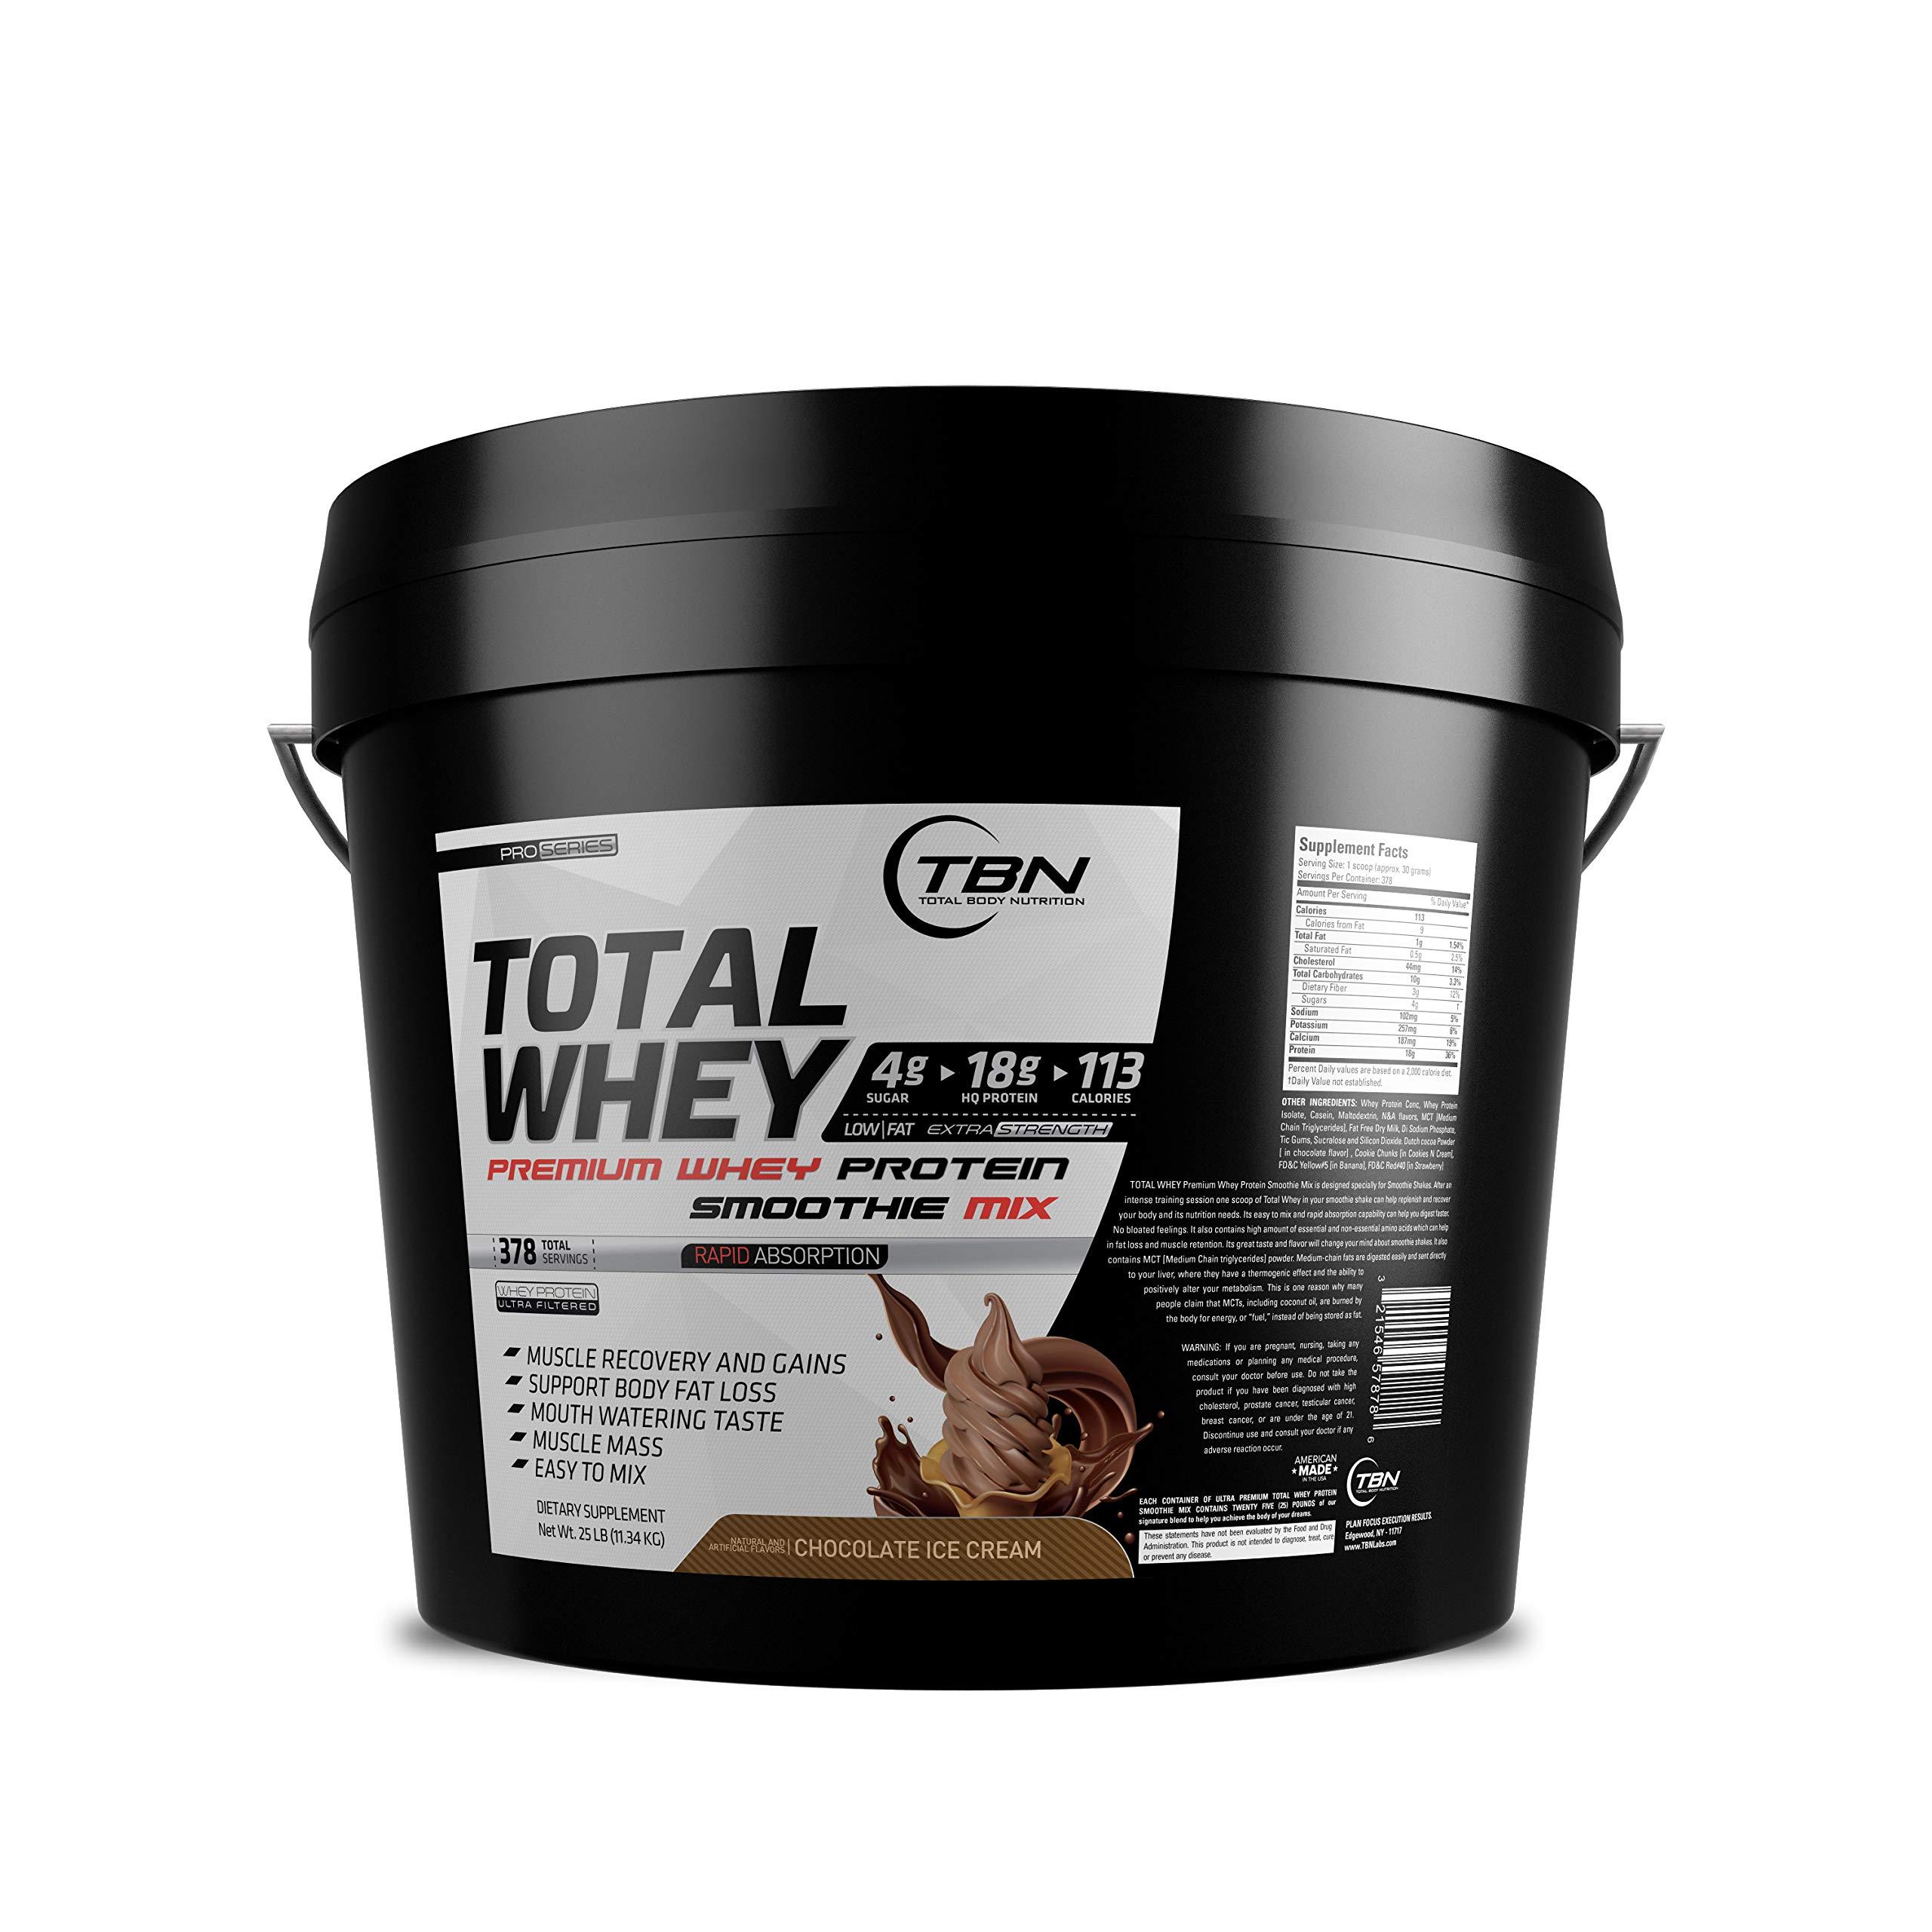 Whey Protein, Protein Shakes, Healthy Shakes, Whey Smoothie 25 Lbs (Dutch Chocolate)